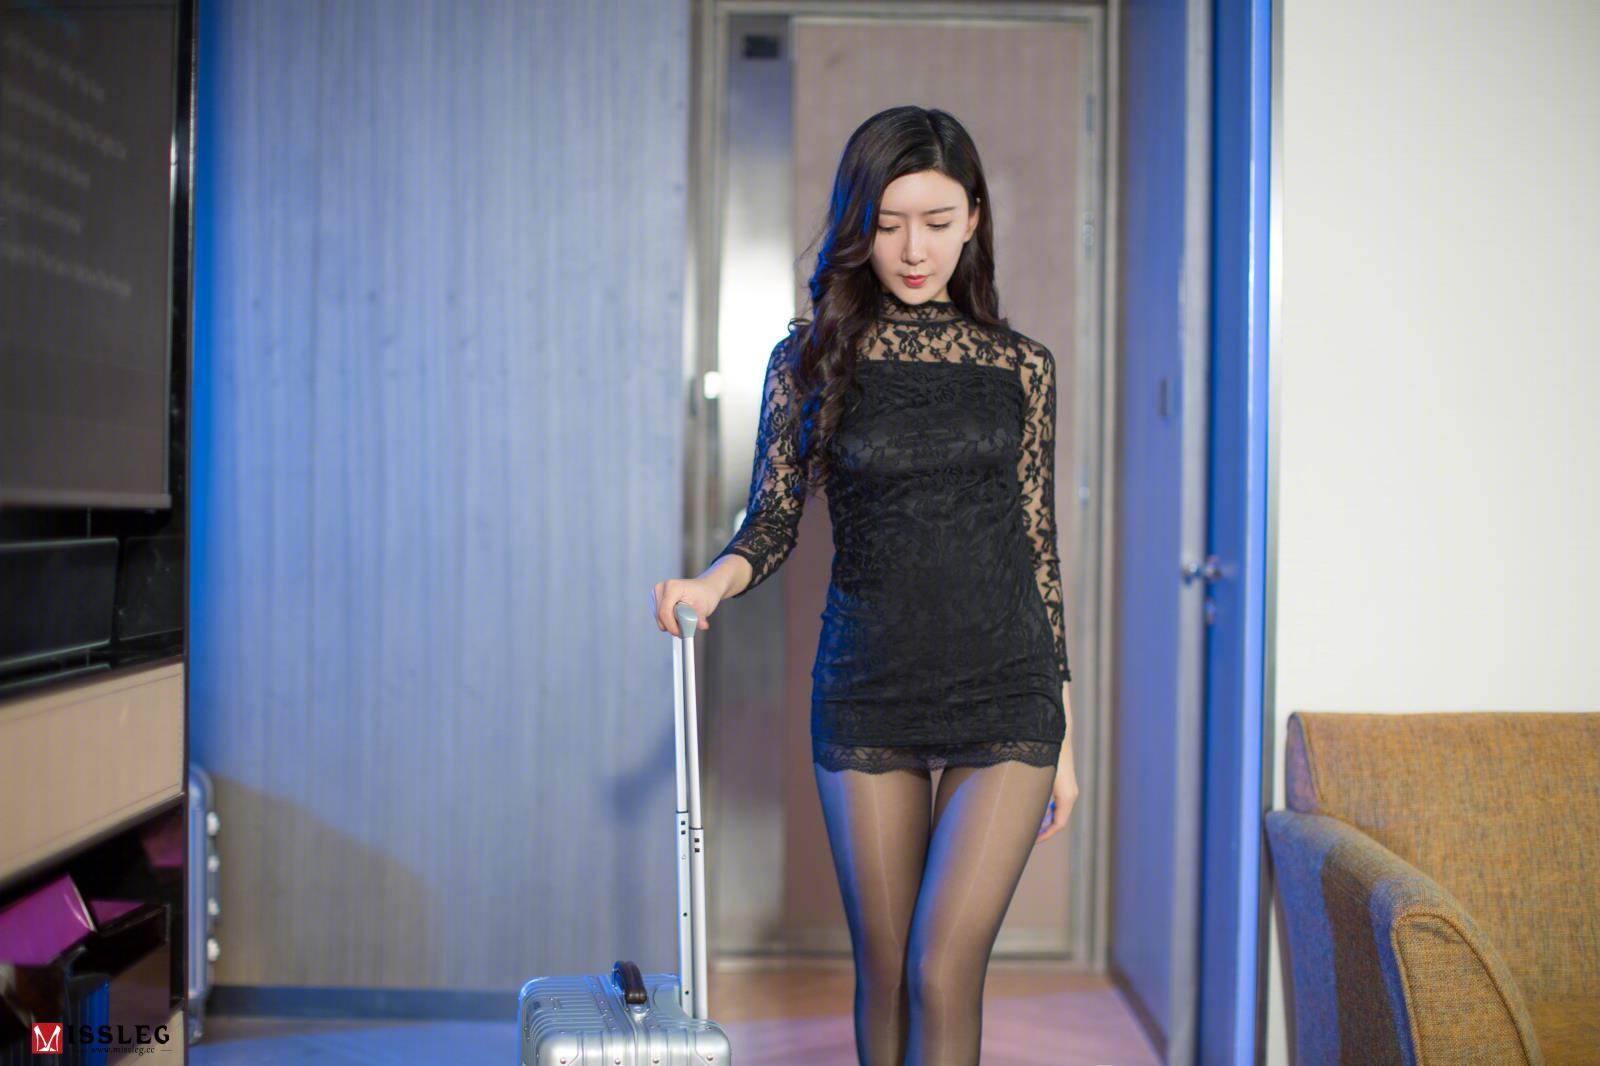 [MISSLEG]蜜丝 钻石室内版   N002 赵智研《出差的夜》